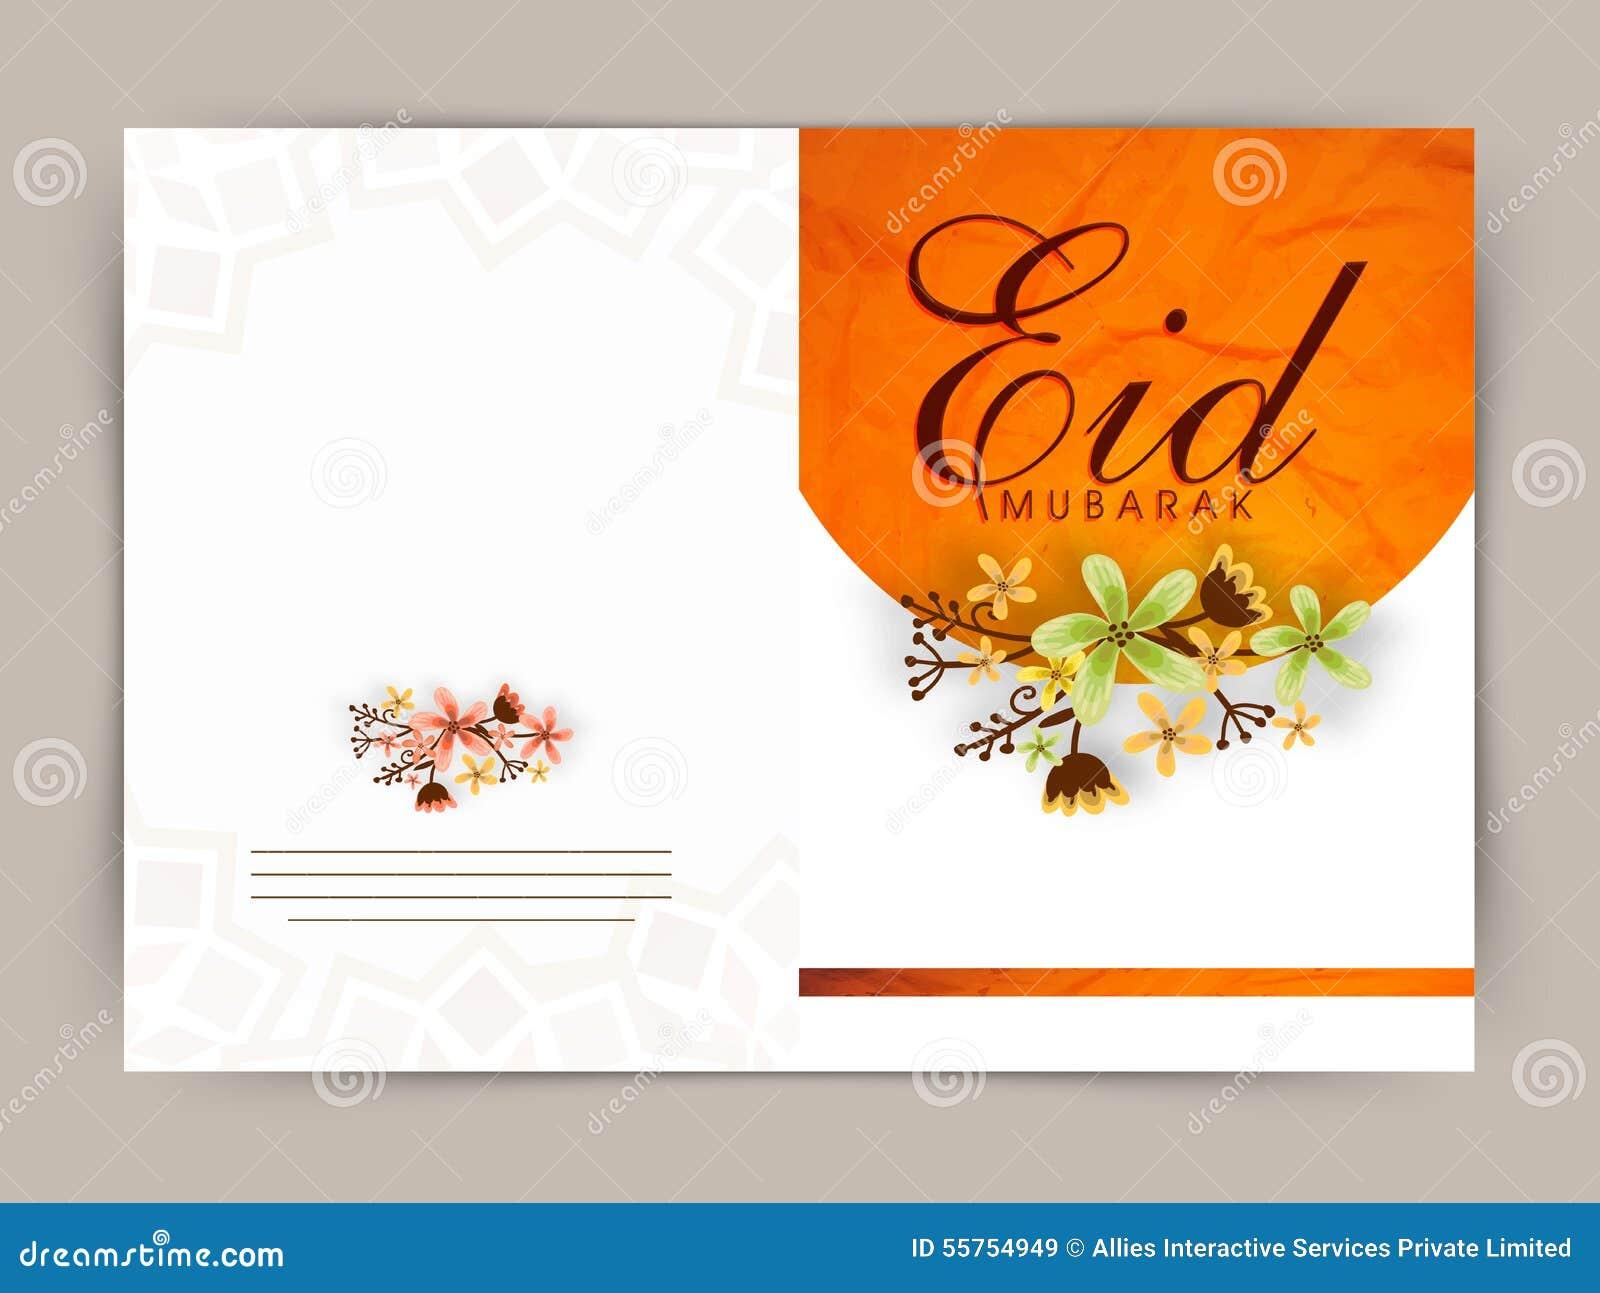 Creative greeting card for eid mubarak celebration stock creative greeting card for eid mubarak celebration m4hsunfo